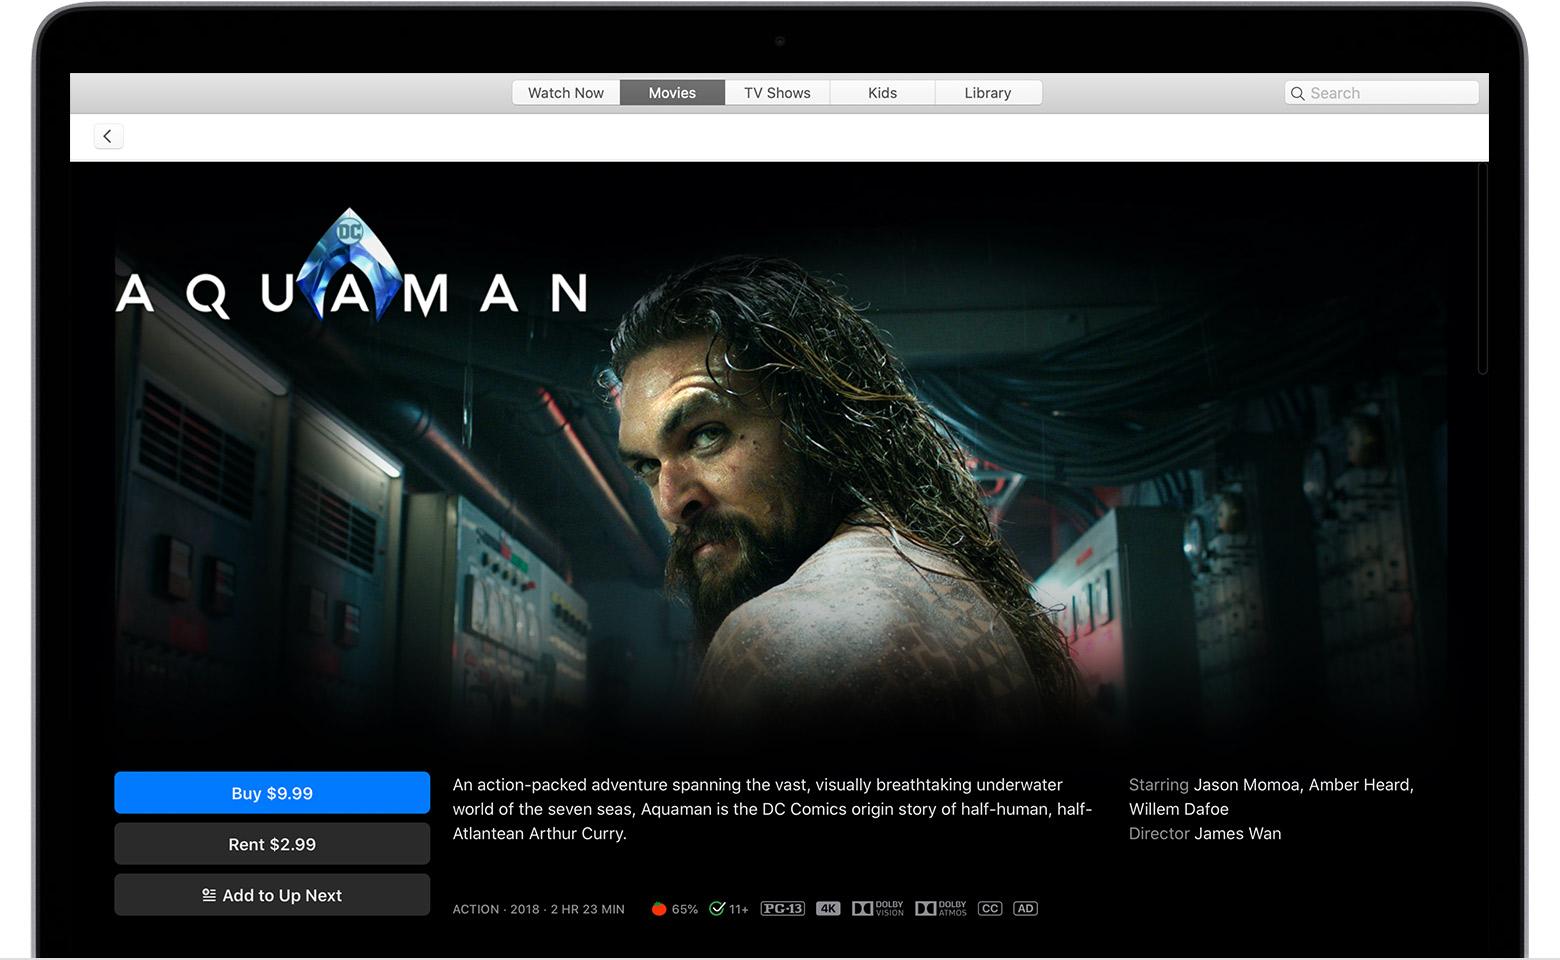 Download movie for macbook